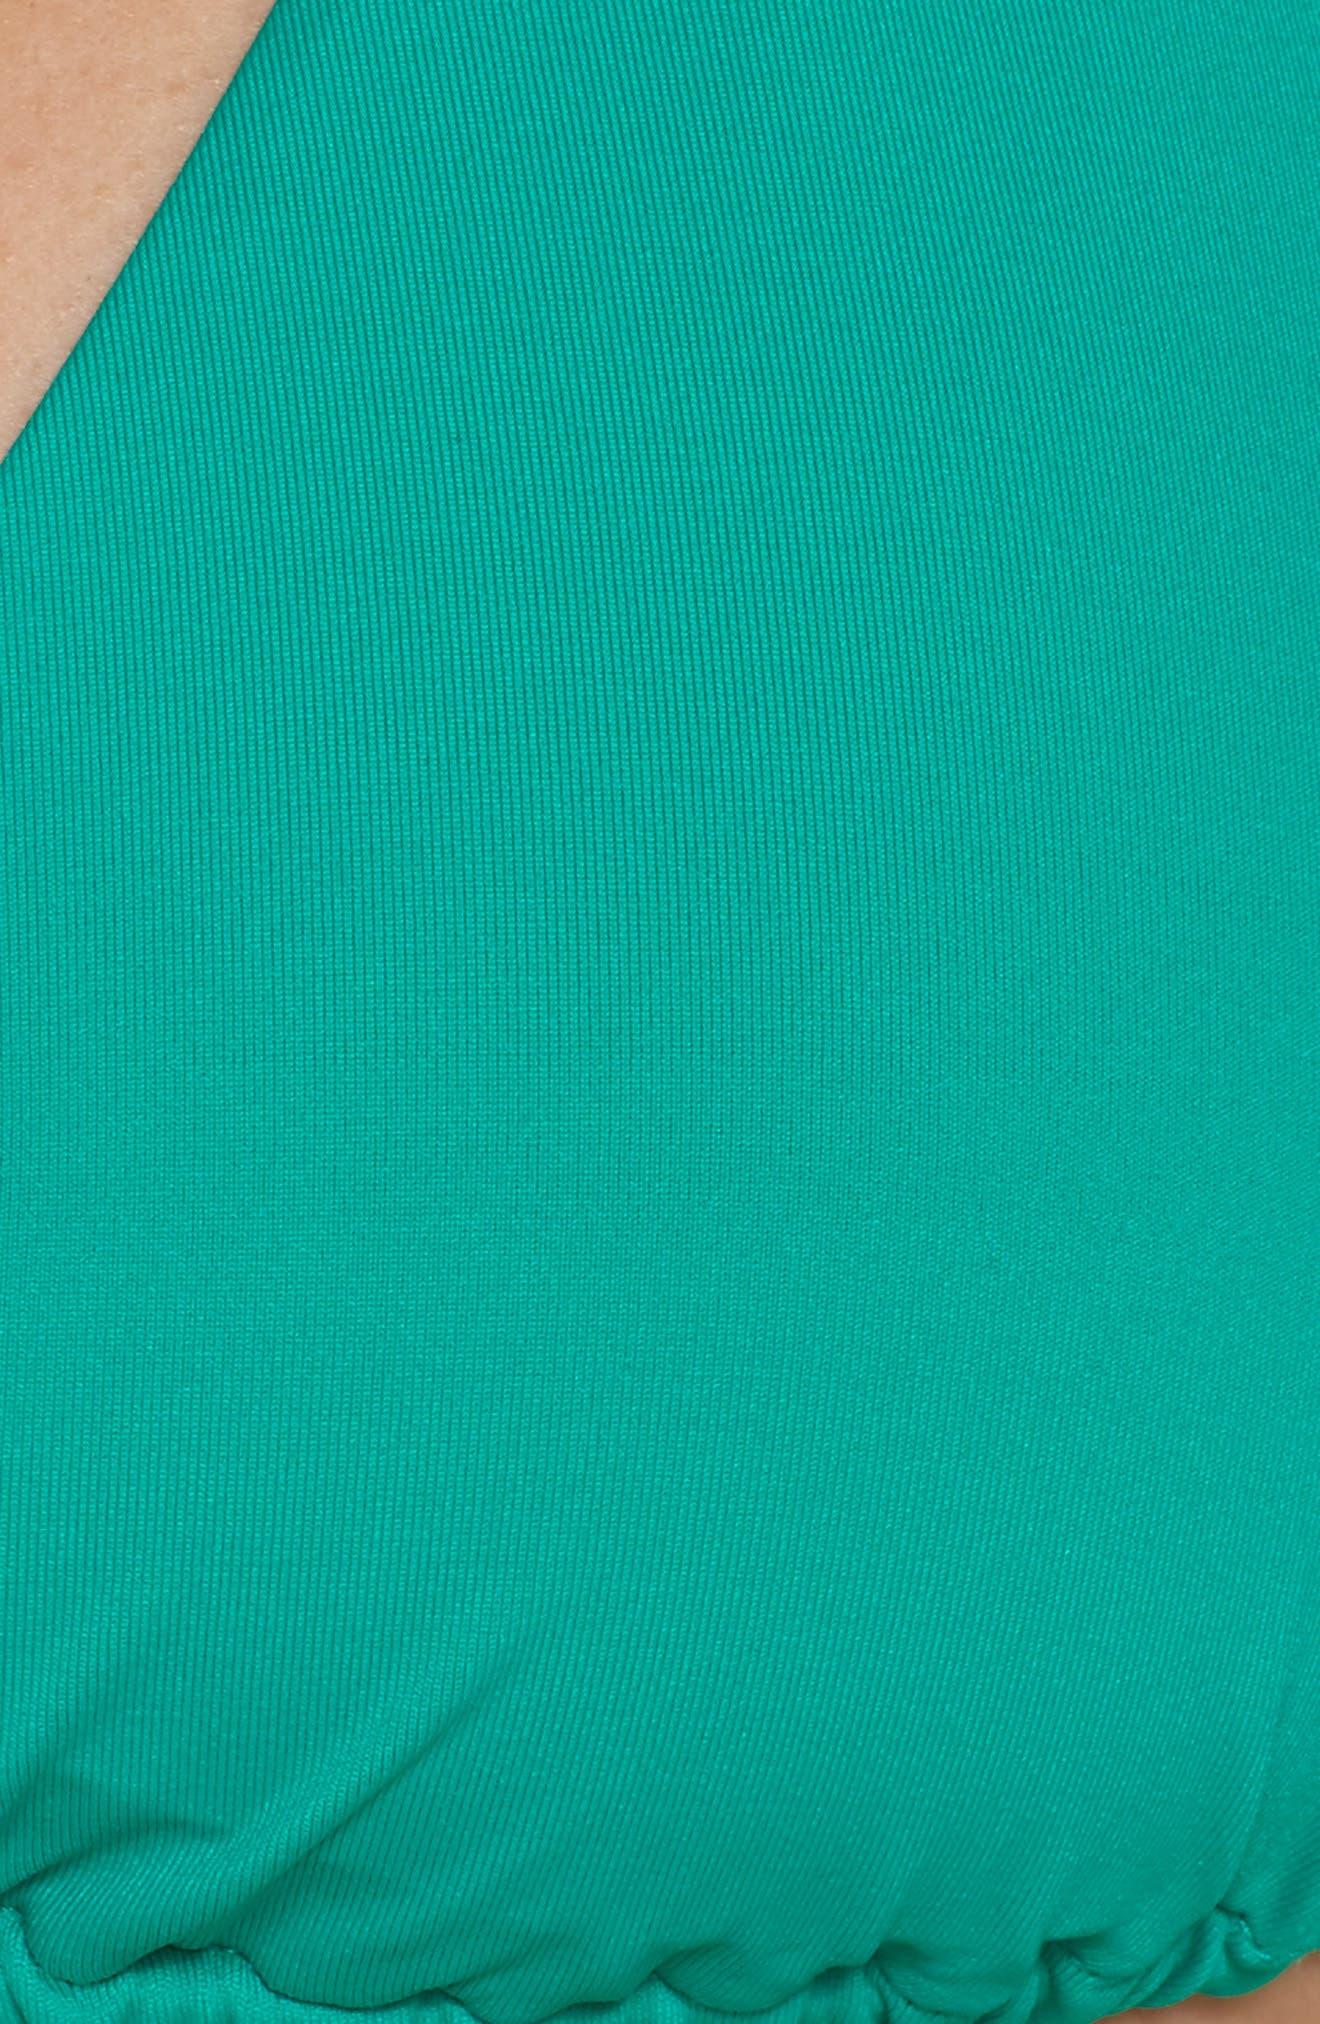 BECCA,                             Color Code Triangle Bikini Top,                             Alternate thumbnail 6, color,                             300